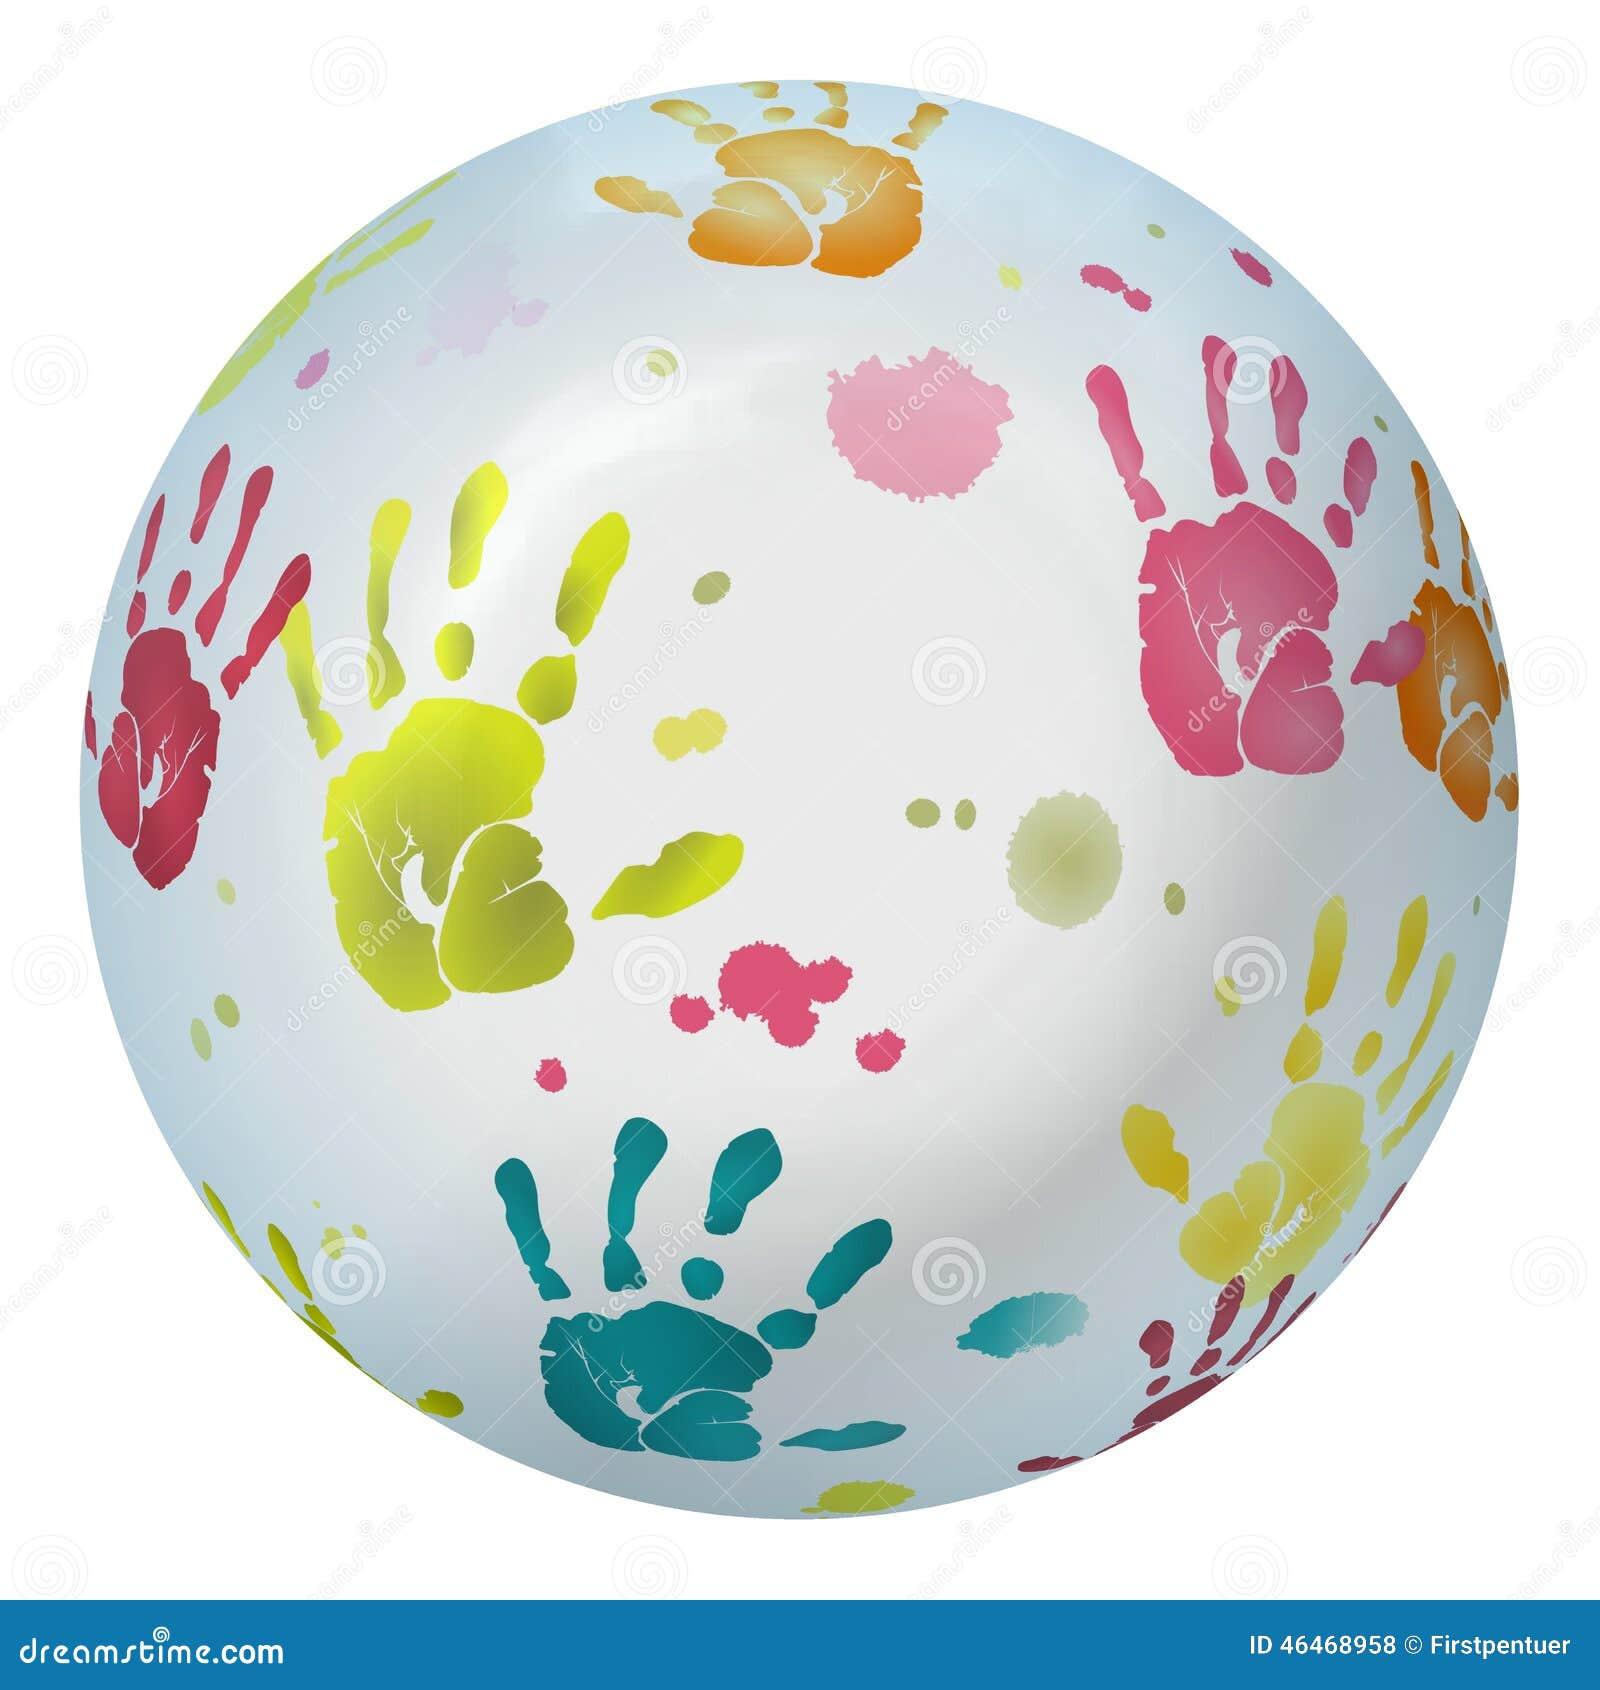 Gekleurd divers handprints in kaart gebracht op bal